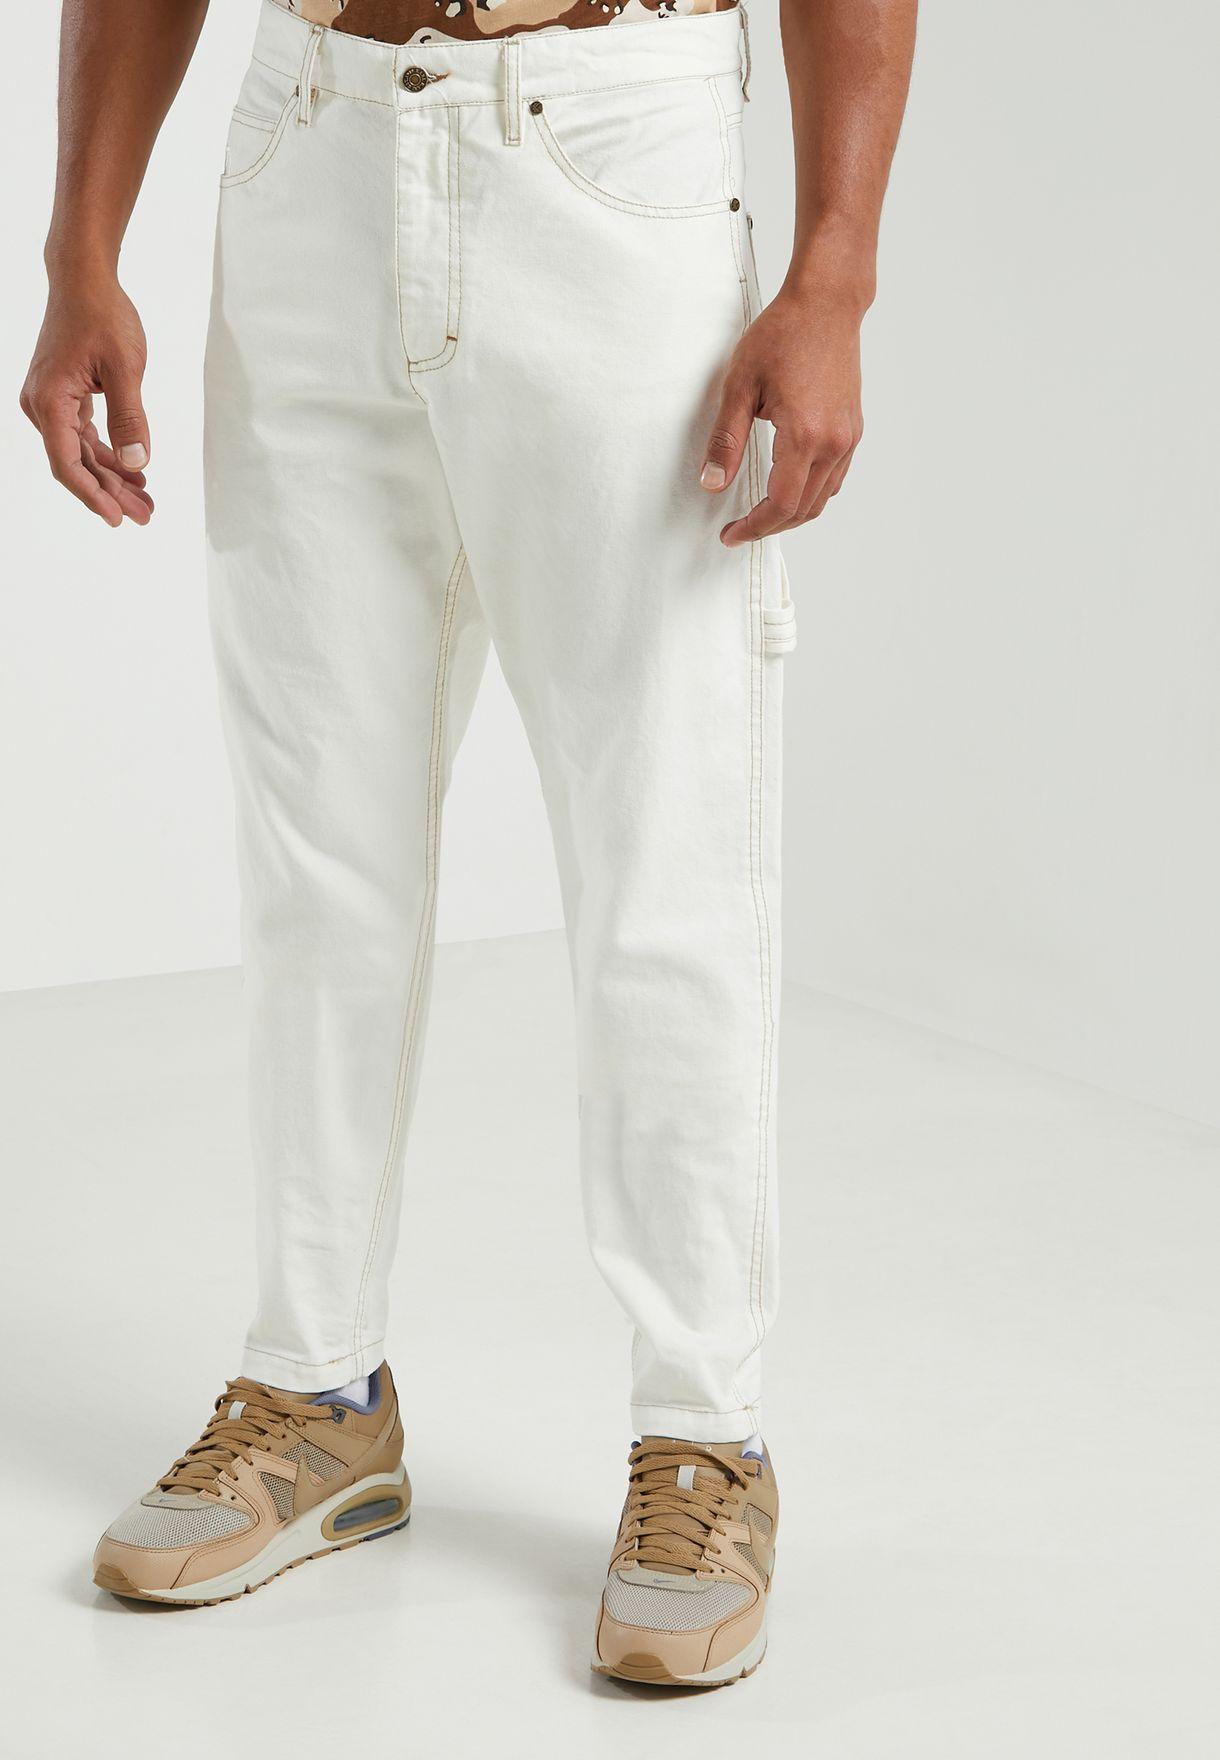 OG Pants